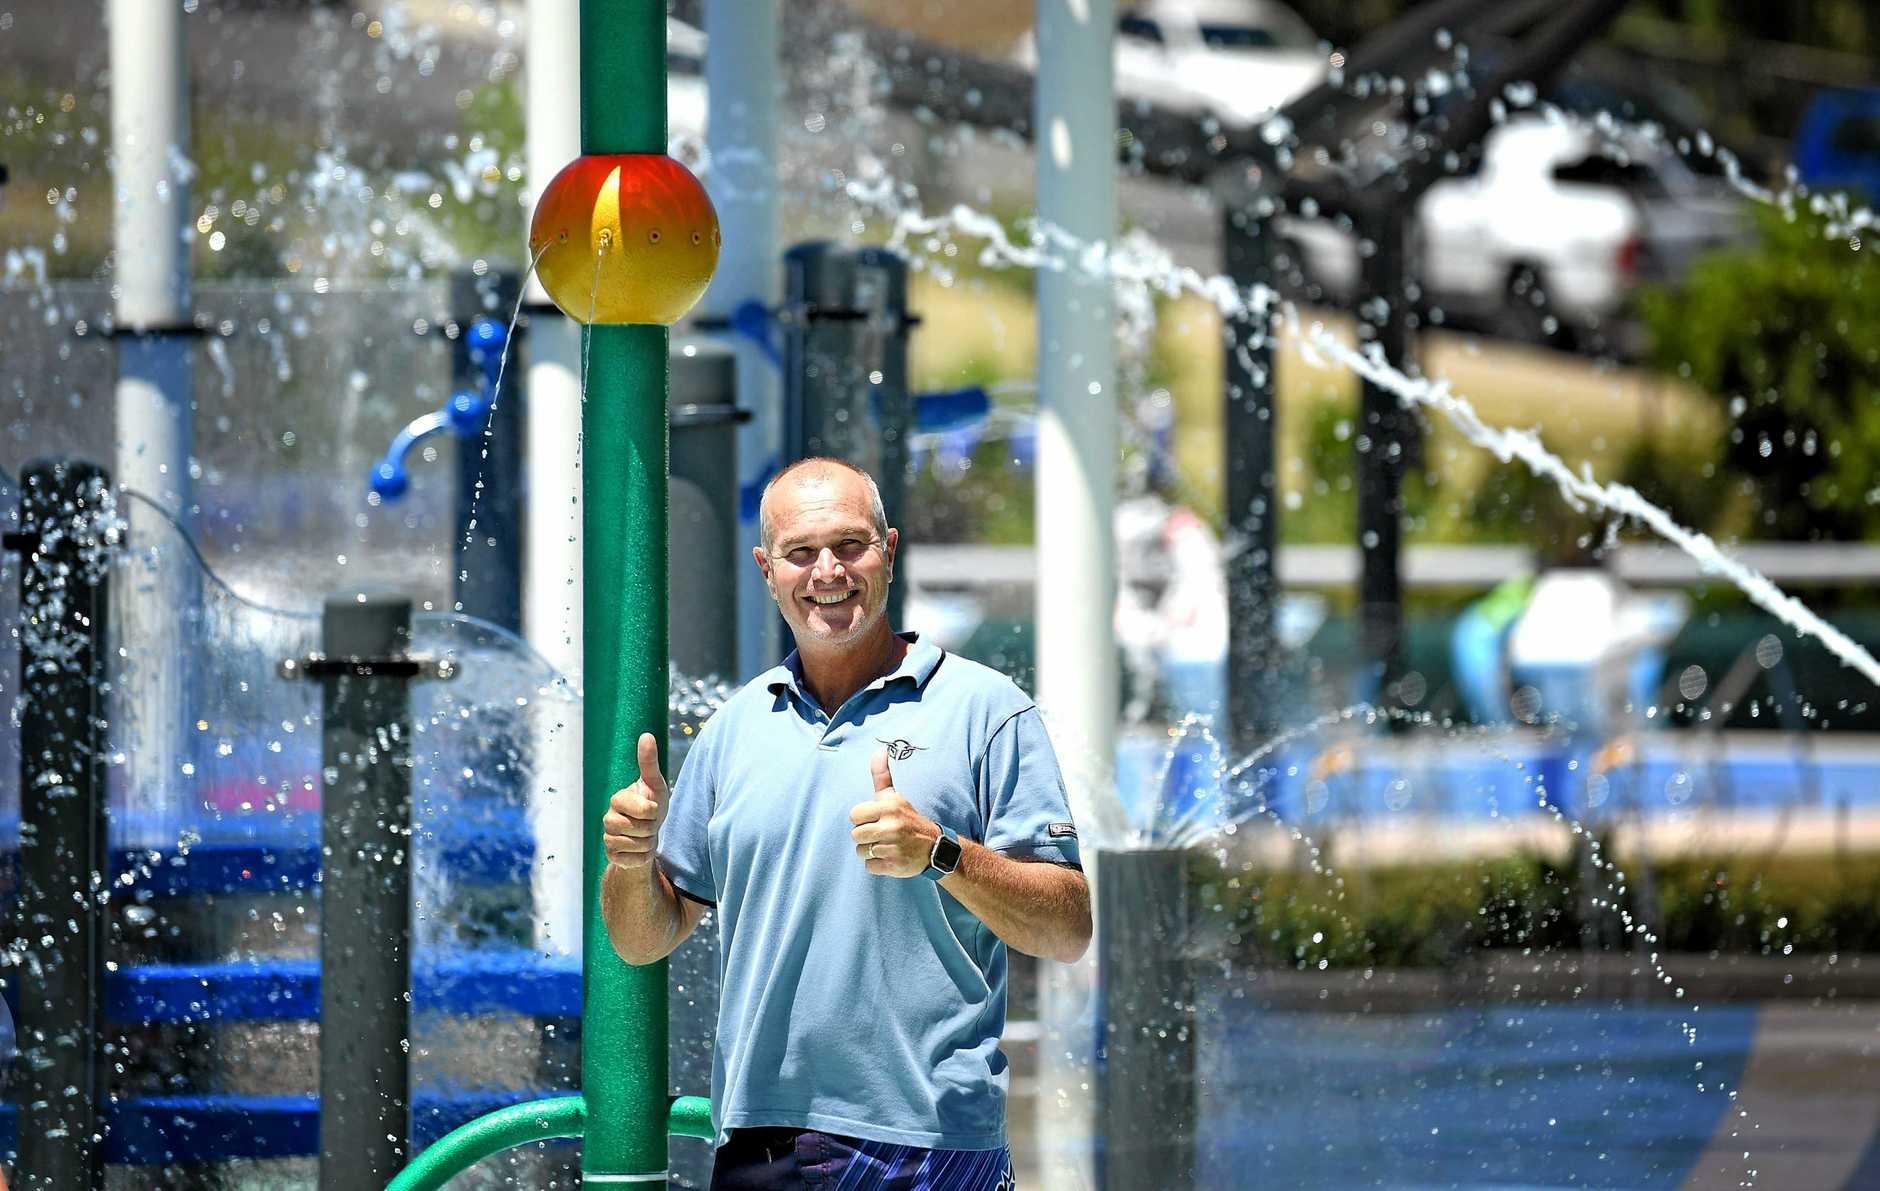 Councilor Bob Leitch at the Gympie Aquatic Centre . Australia day free entry.